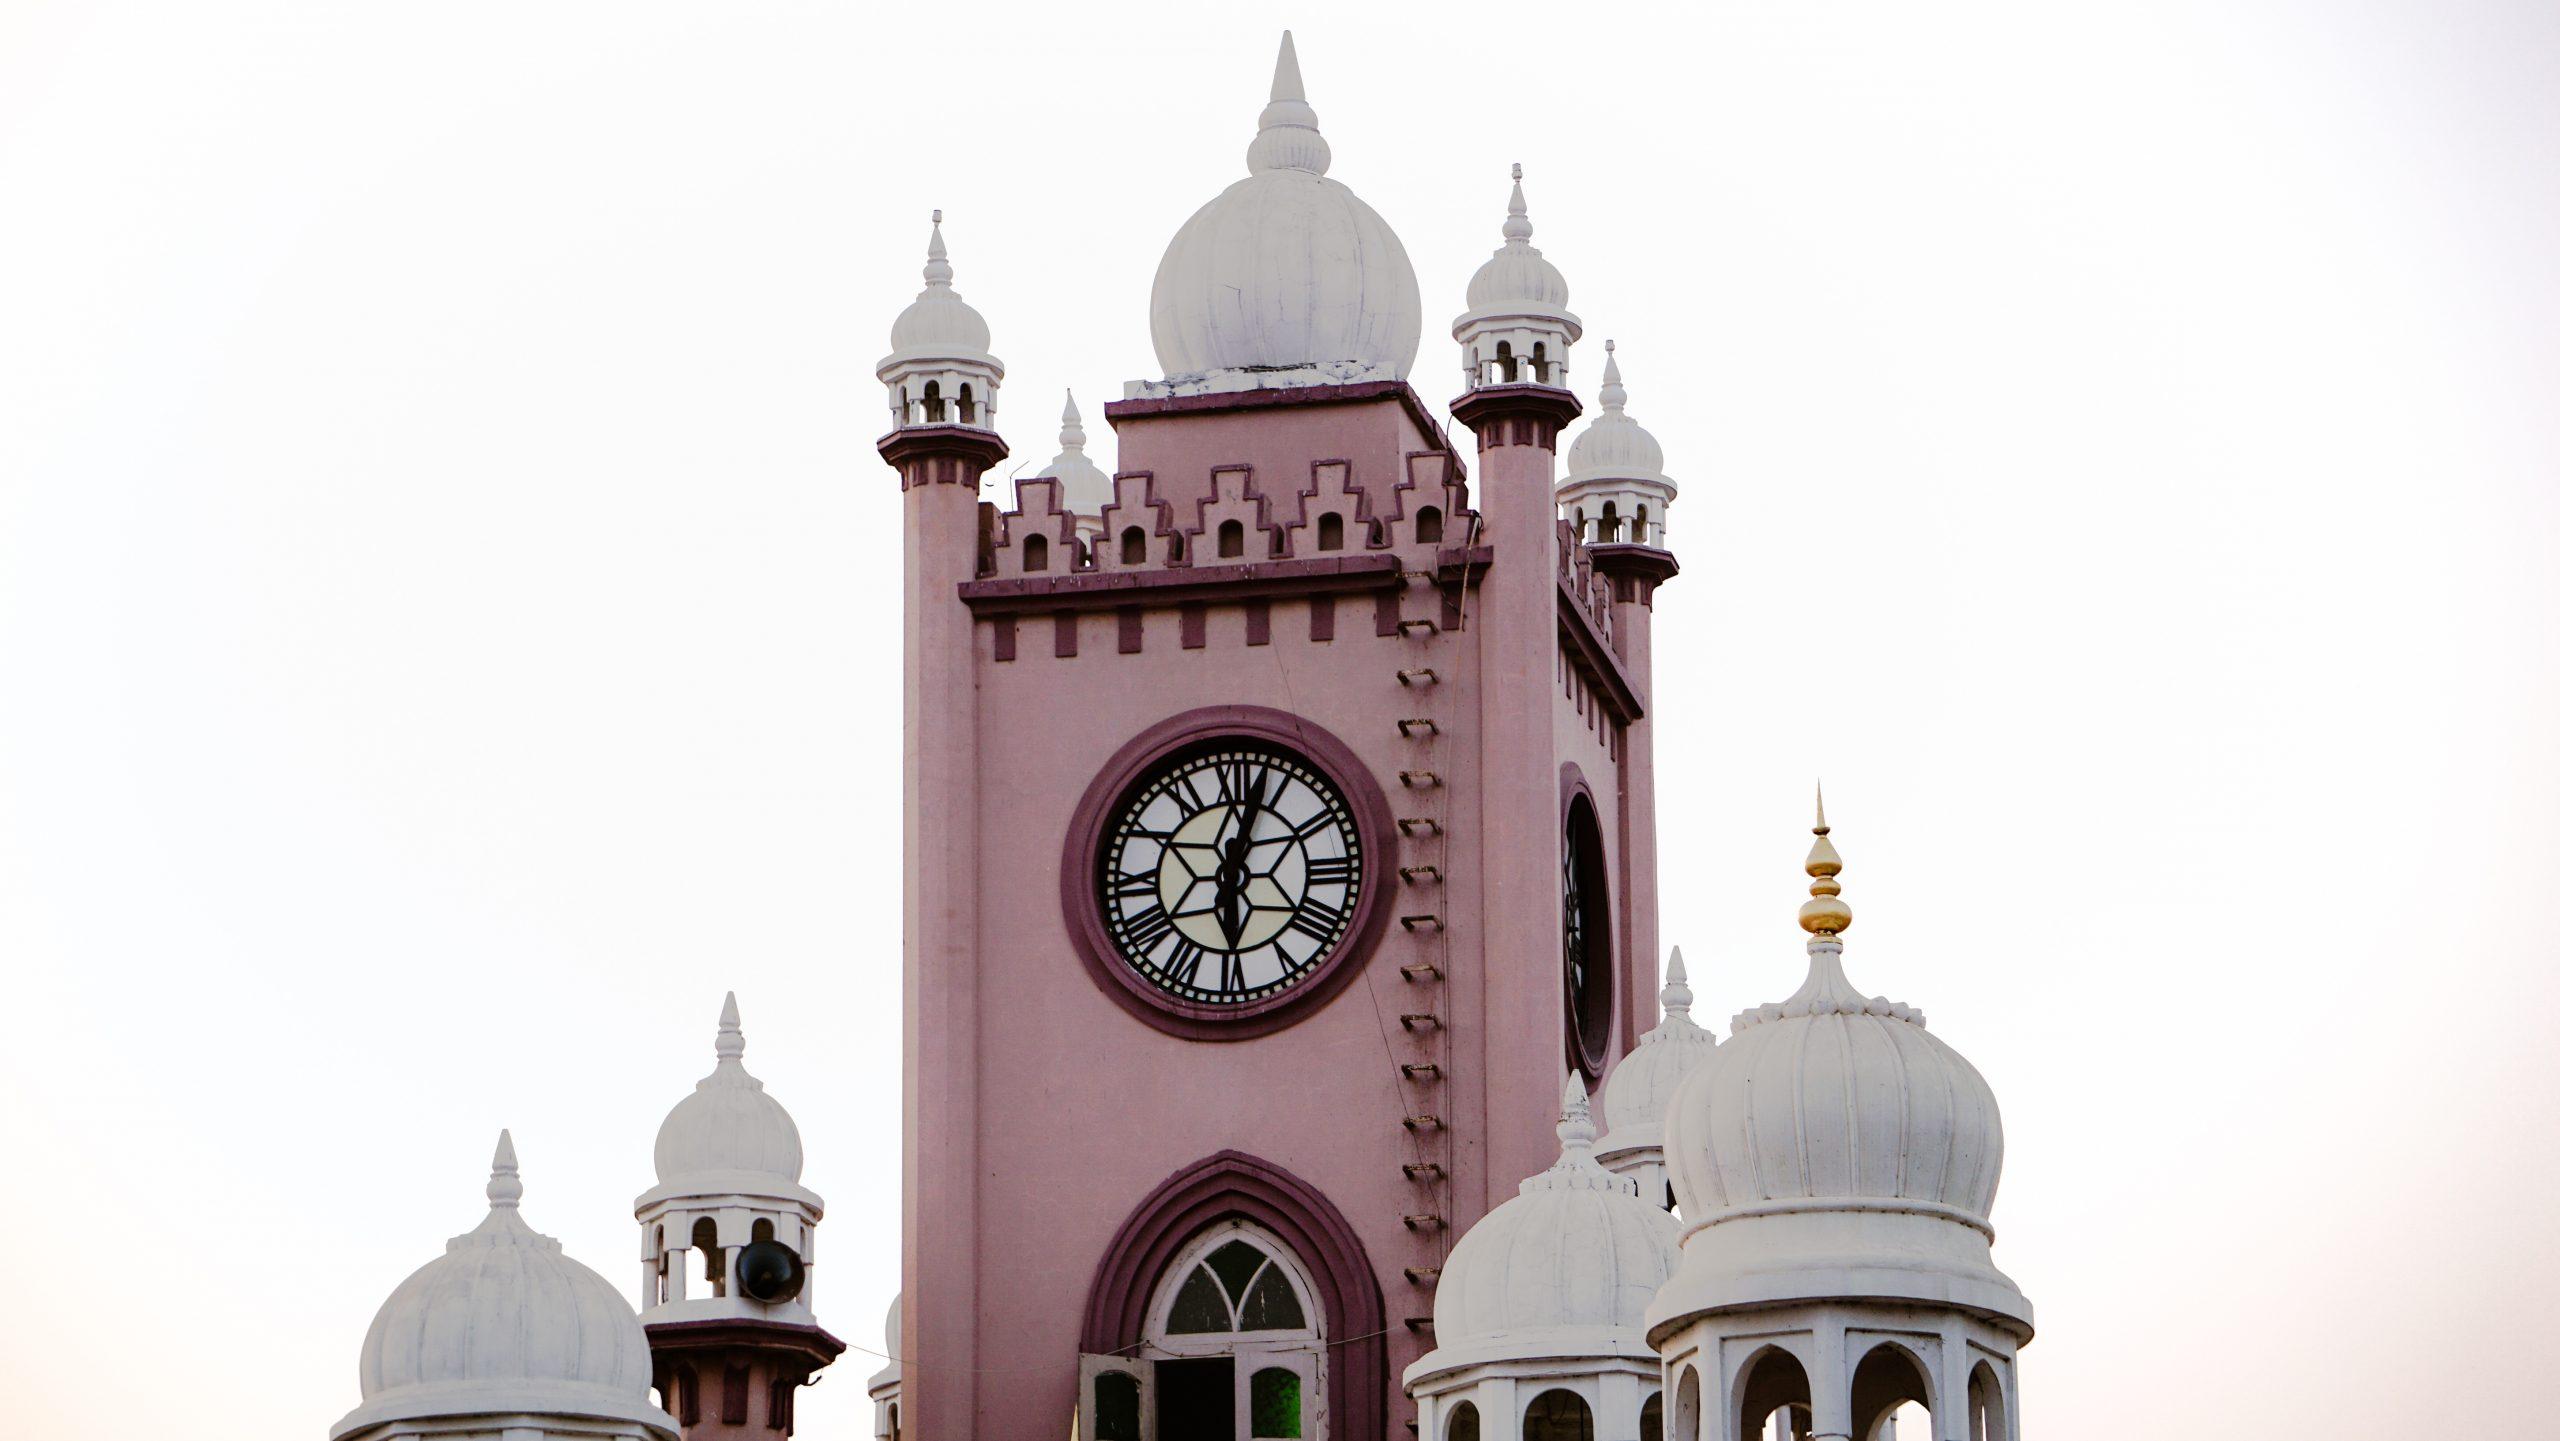 Saifee Clock Tower in Jamnagar, Gujarat, India,